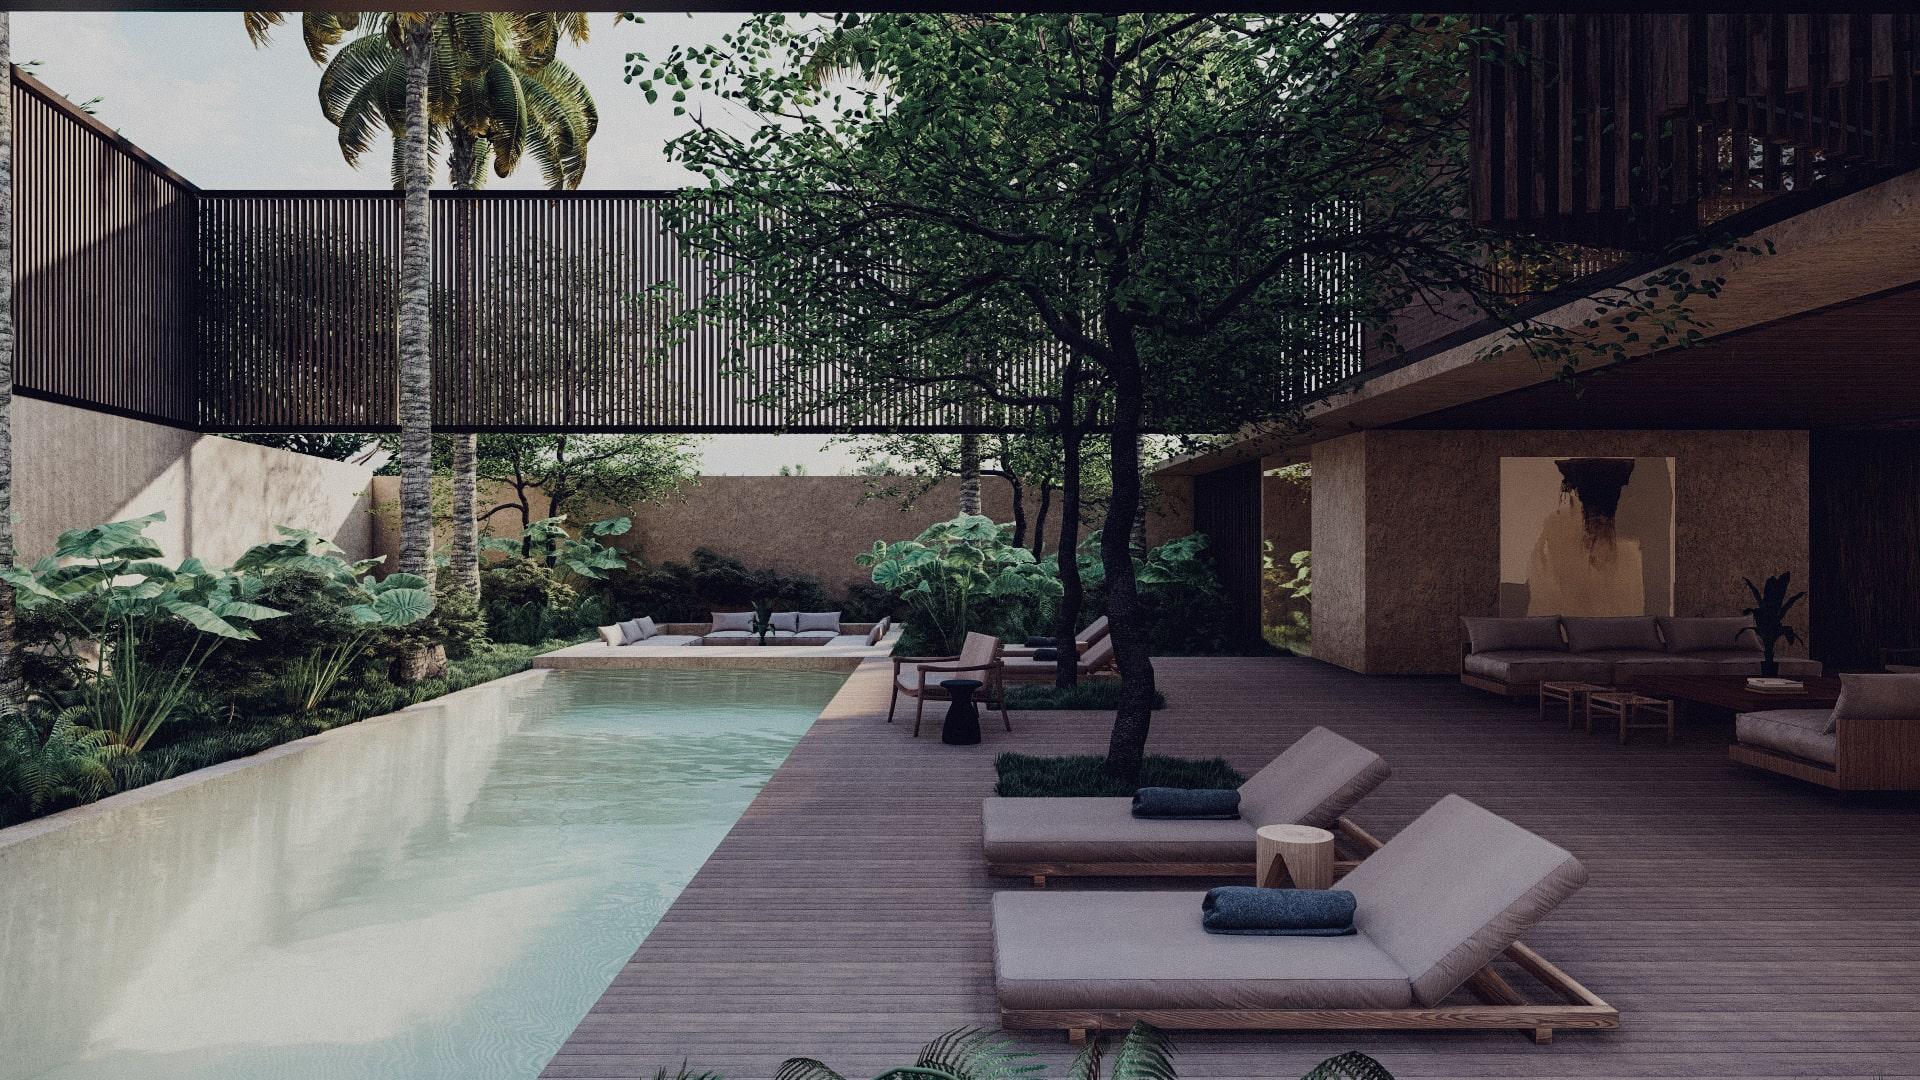 Tropical House in Lombok Krandangan Pool and pool deck